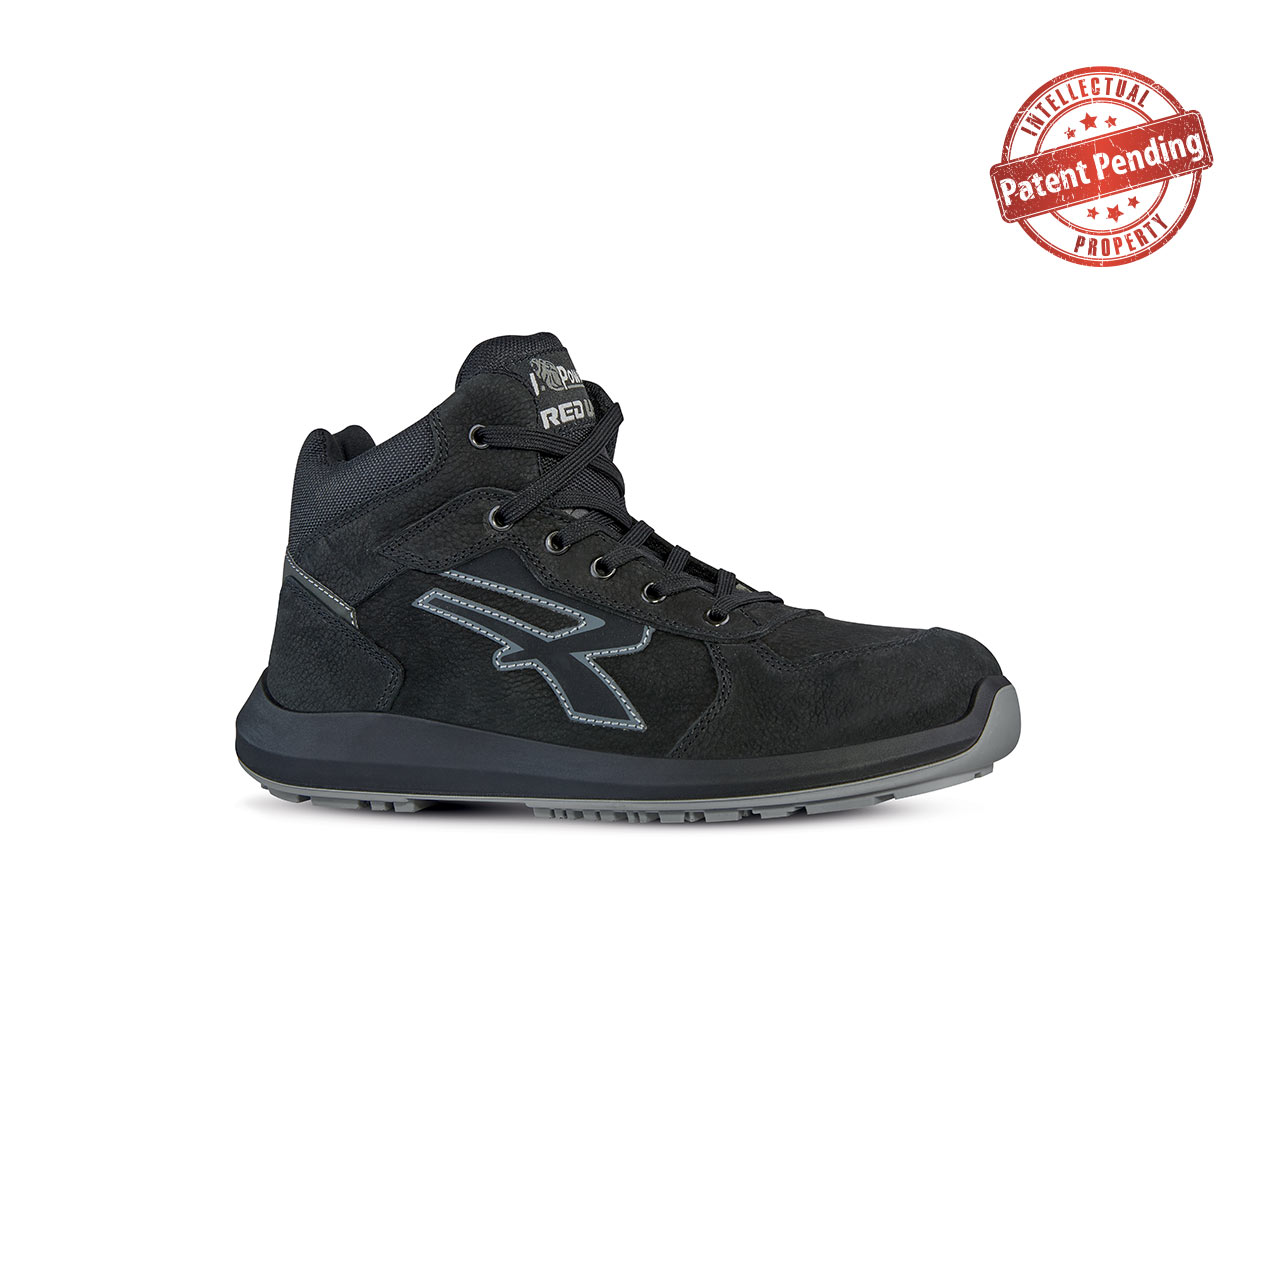 scarpa antinfortunistica alta upower modello nek linea redup vista laterale